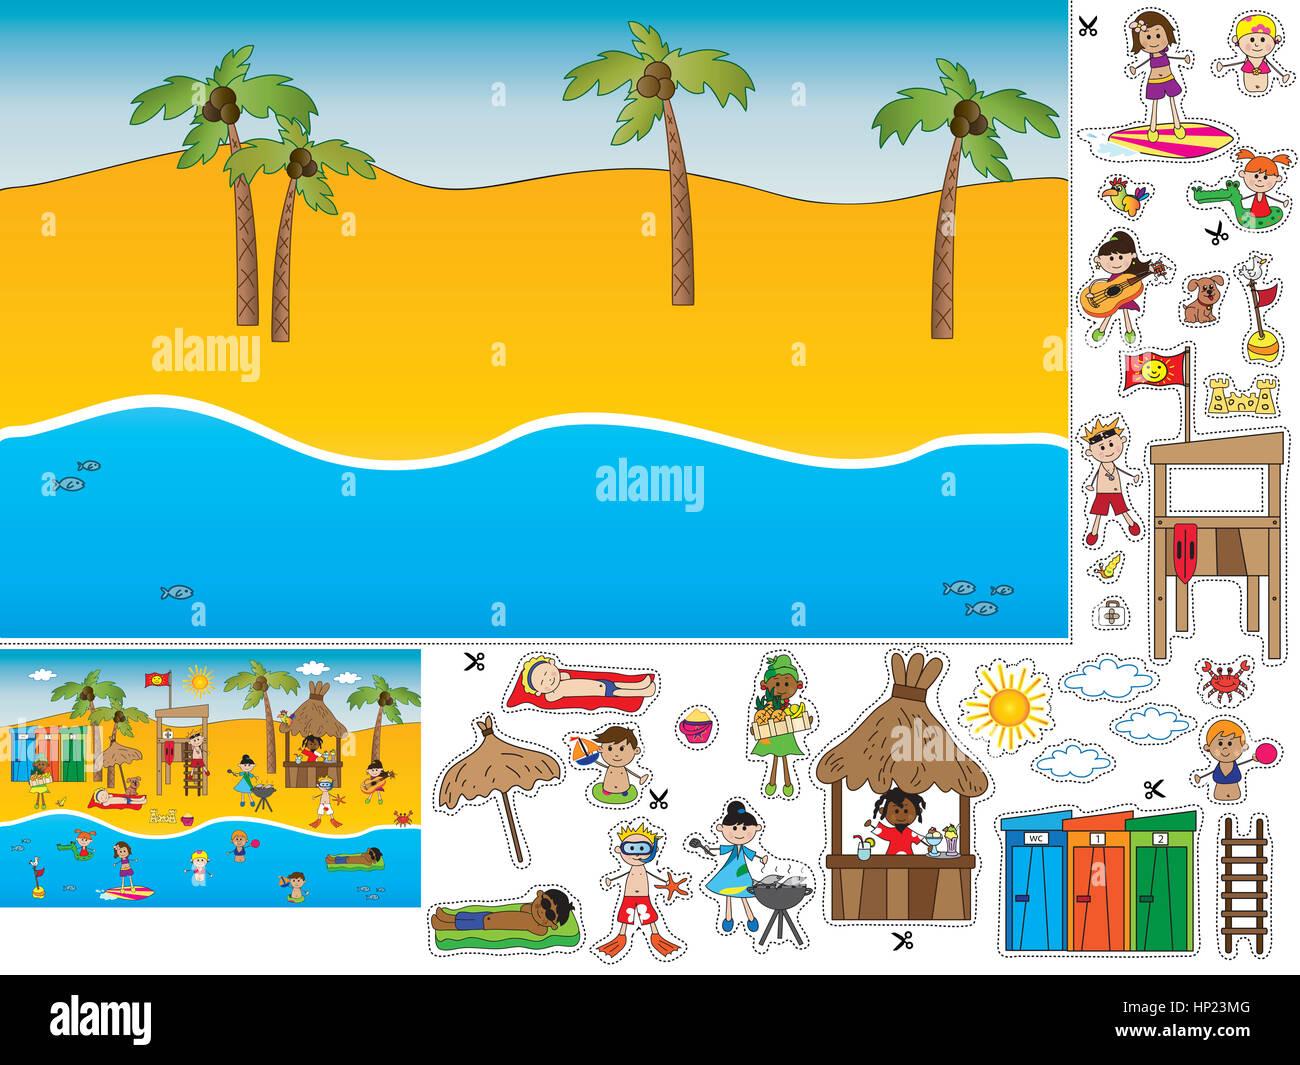 Game Children Cut Paste Stock Photos & Game Children Cut Paste Stock ...